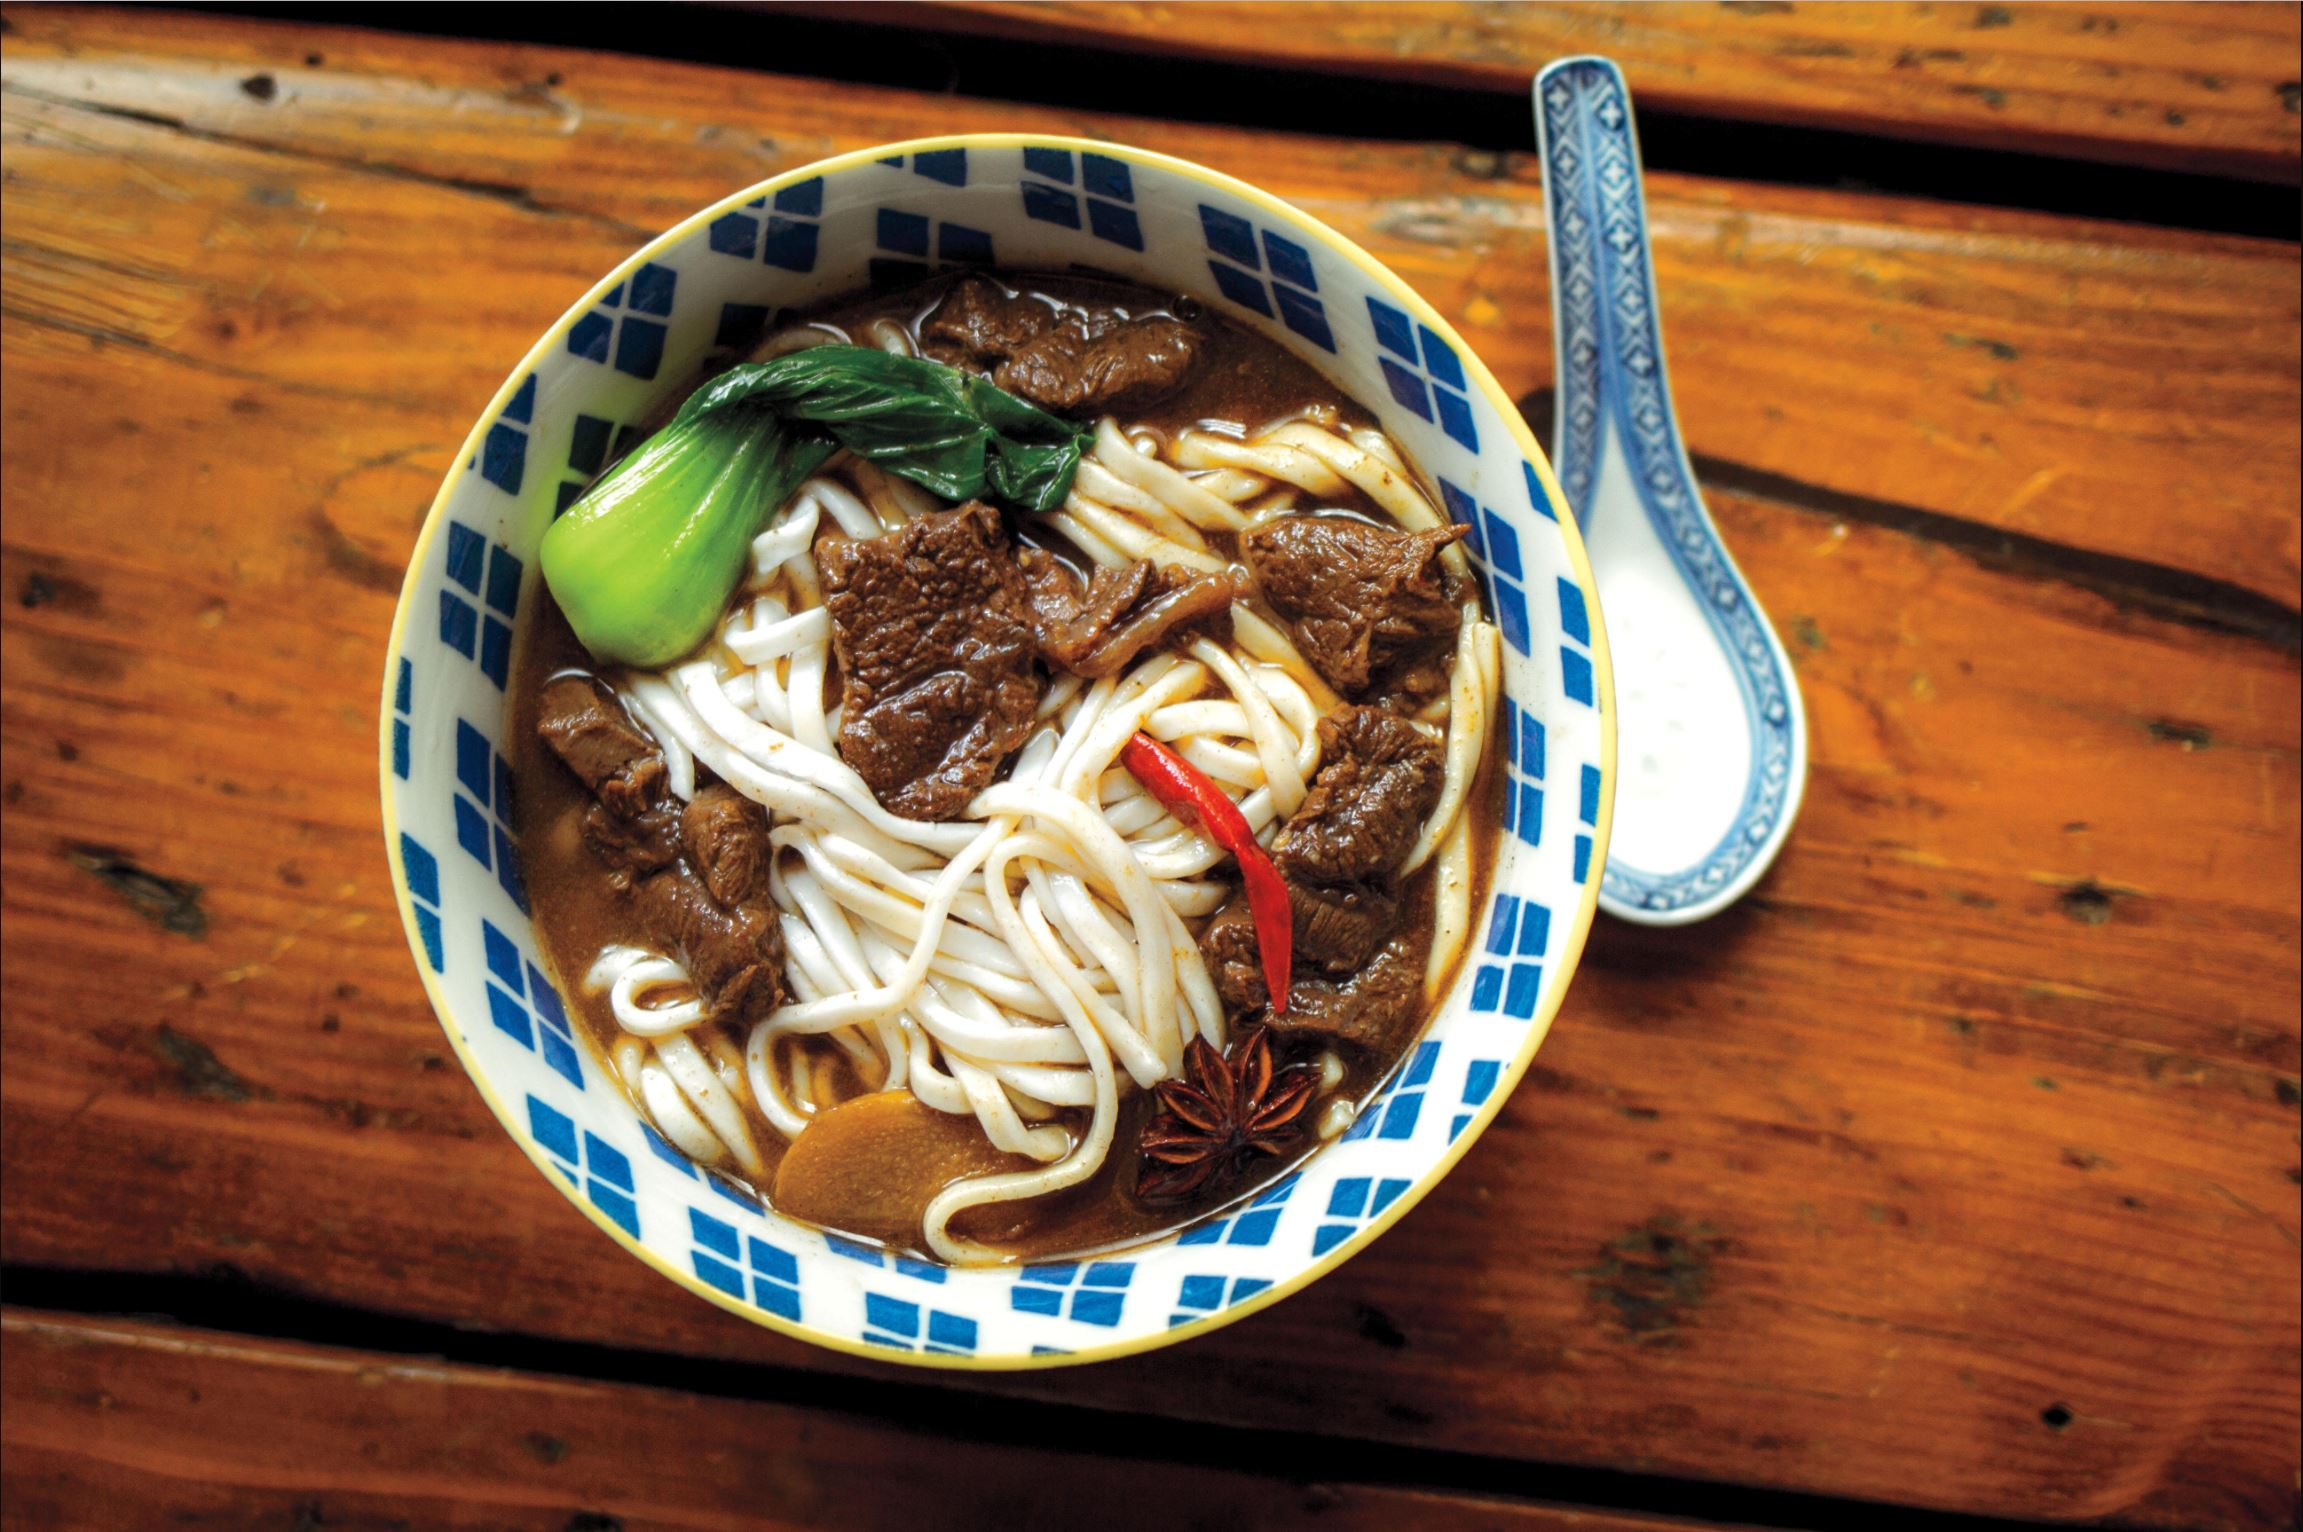 Taiwan, Kingdom of food